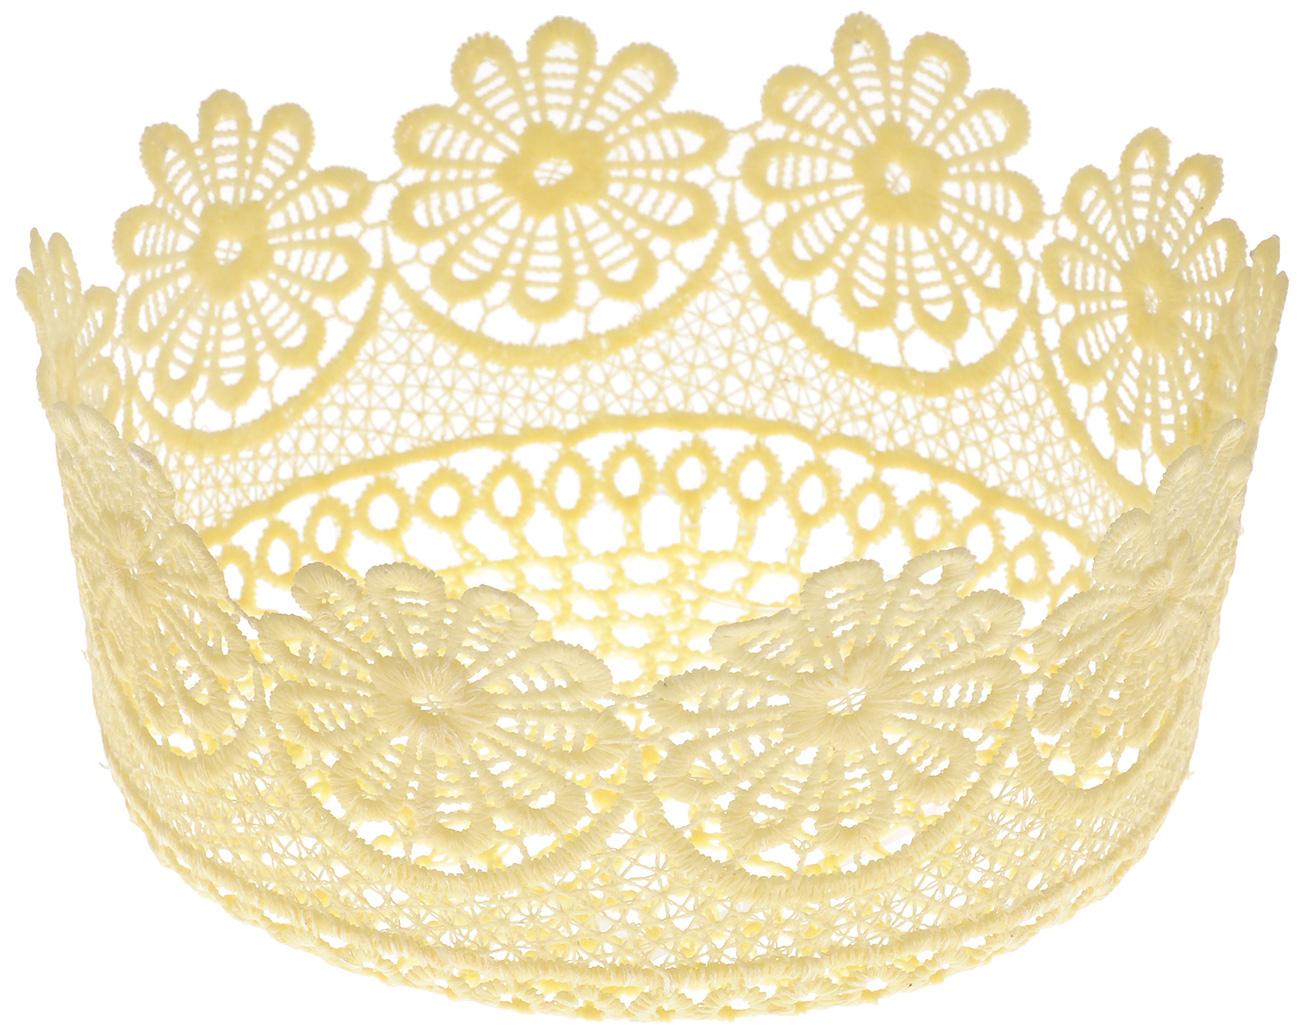 Корзина декоративная Home Queen Ромашки, цвет: желтый, диаметр 17 см мочалка из нейлона home queen цвет желтый 57199